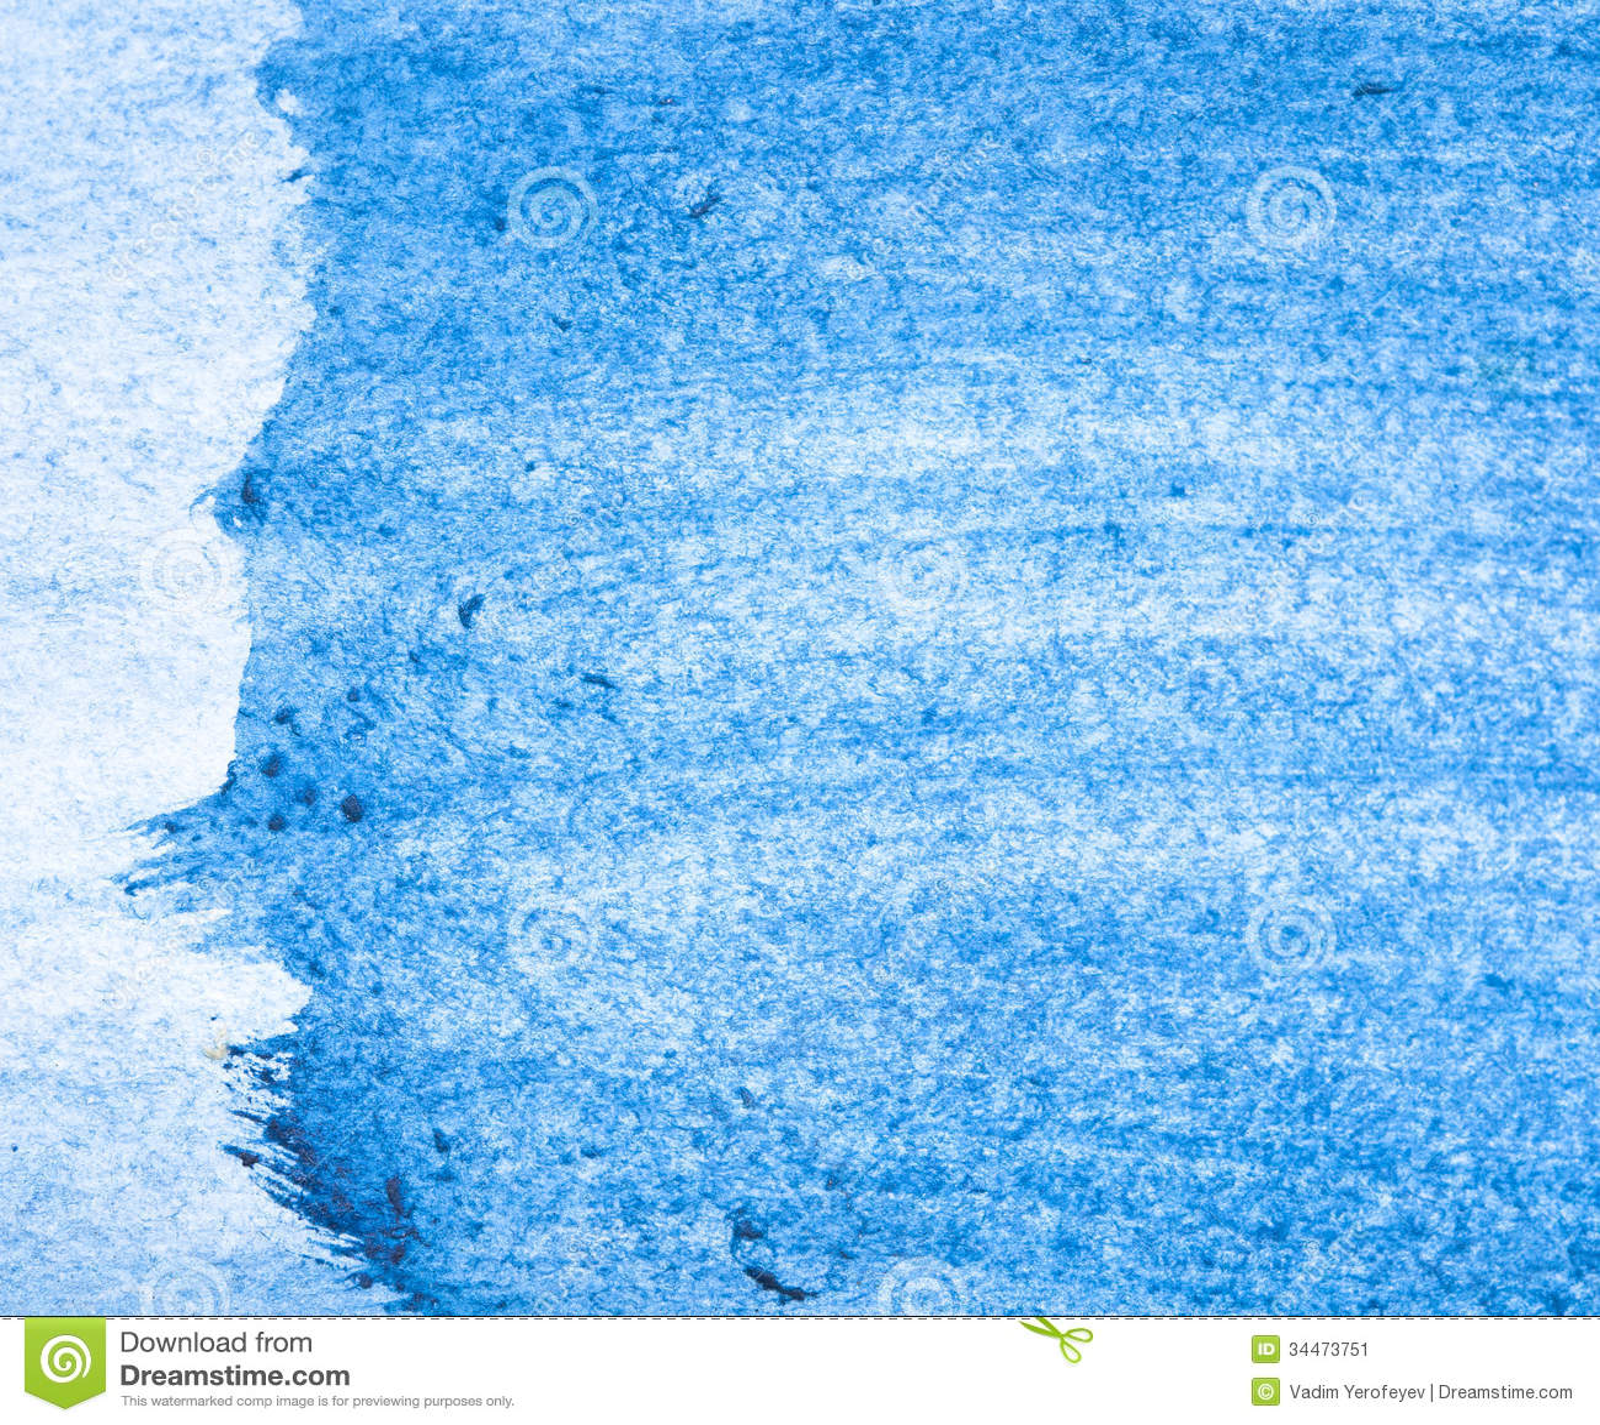 beautiful blue watercolor background stock image image 34473751. Black Bedroom Furniture Sets. Home Design Ideas